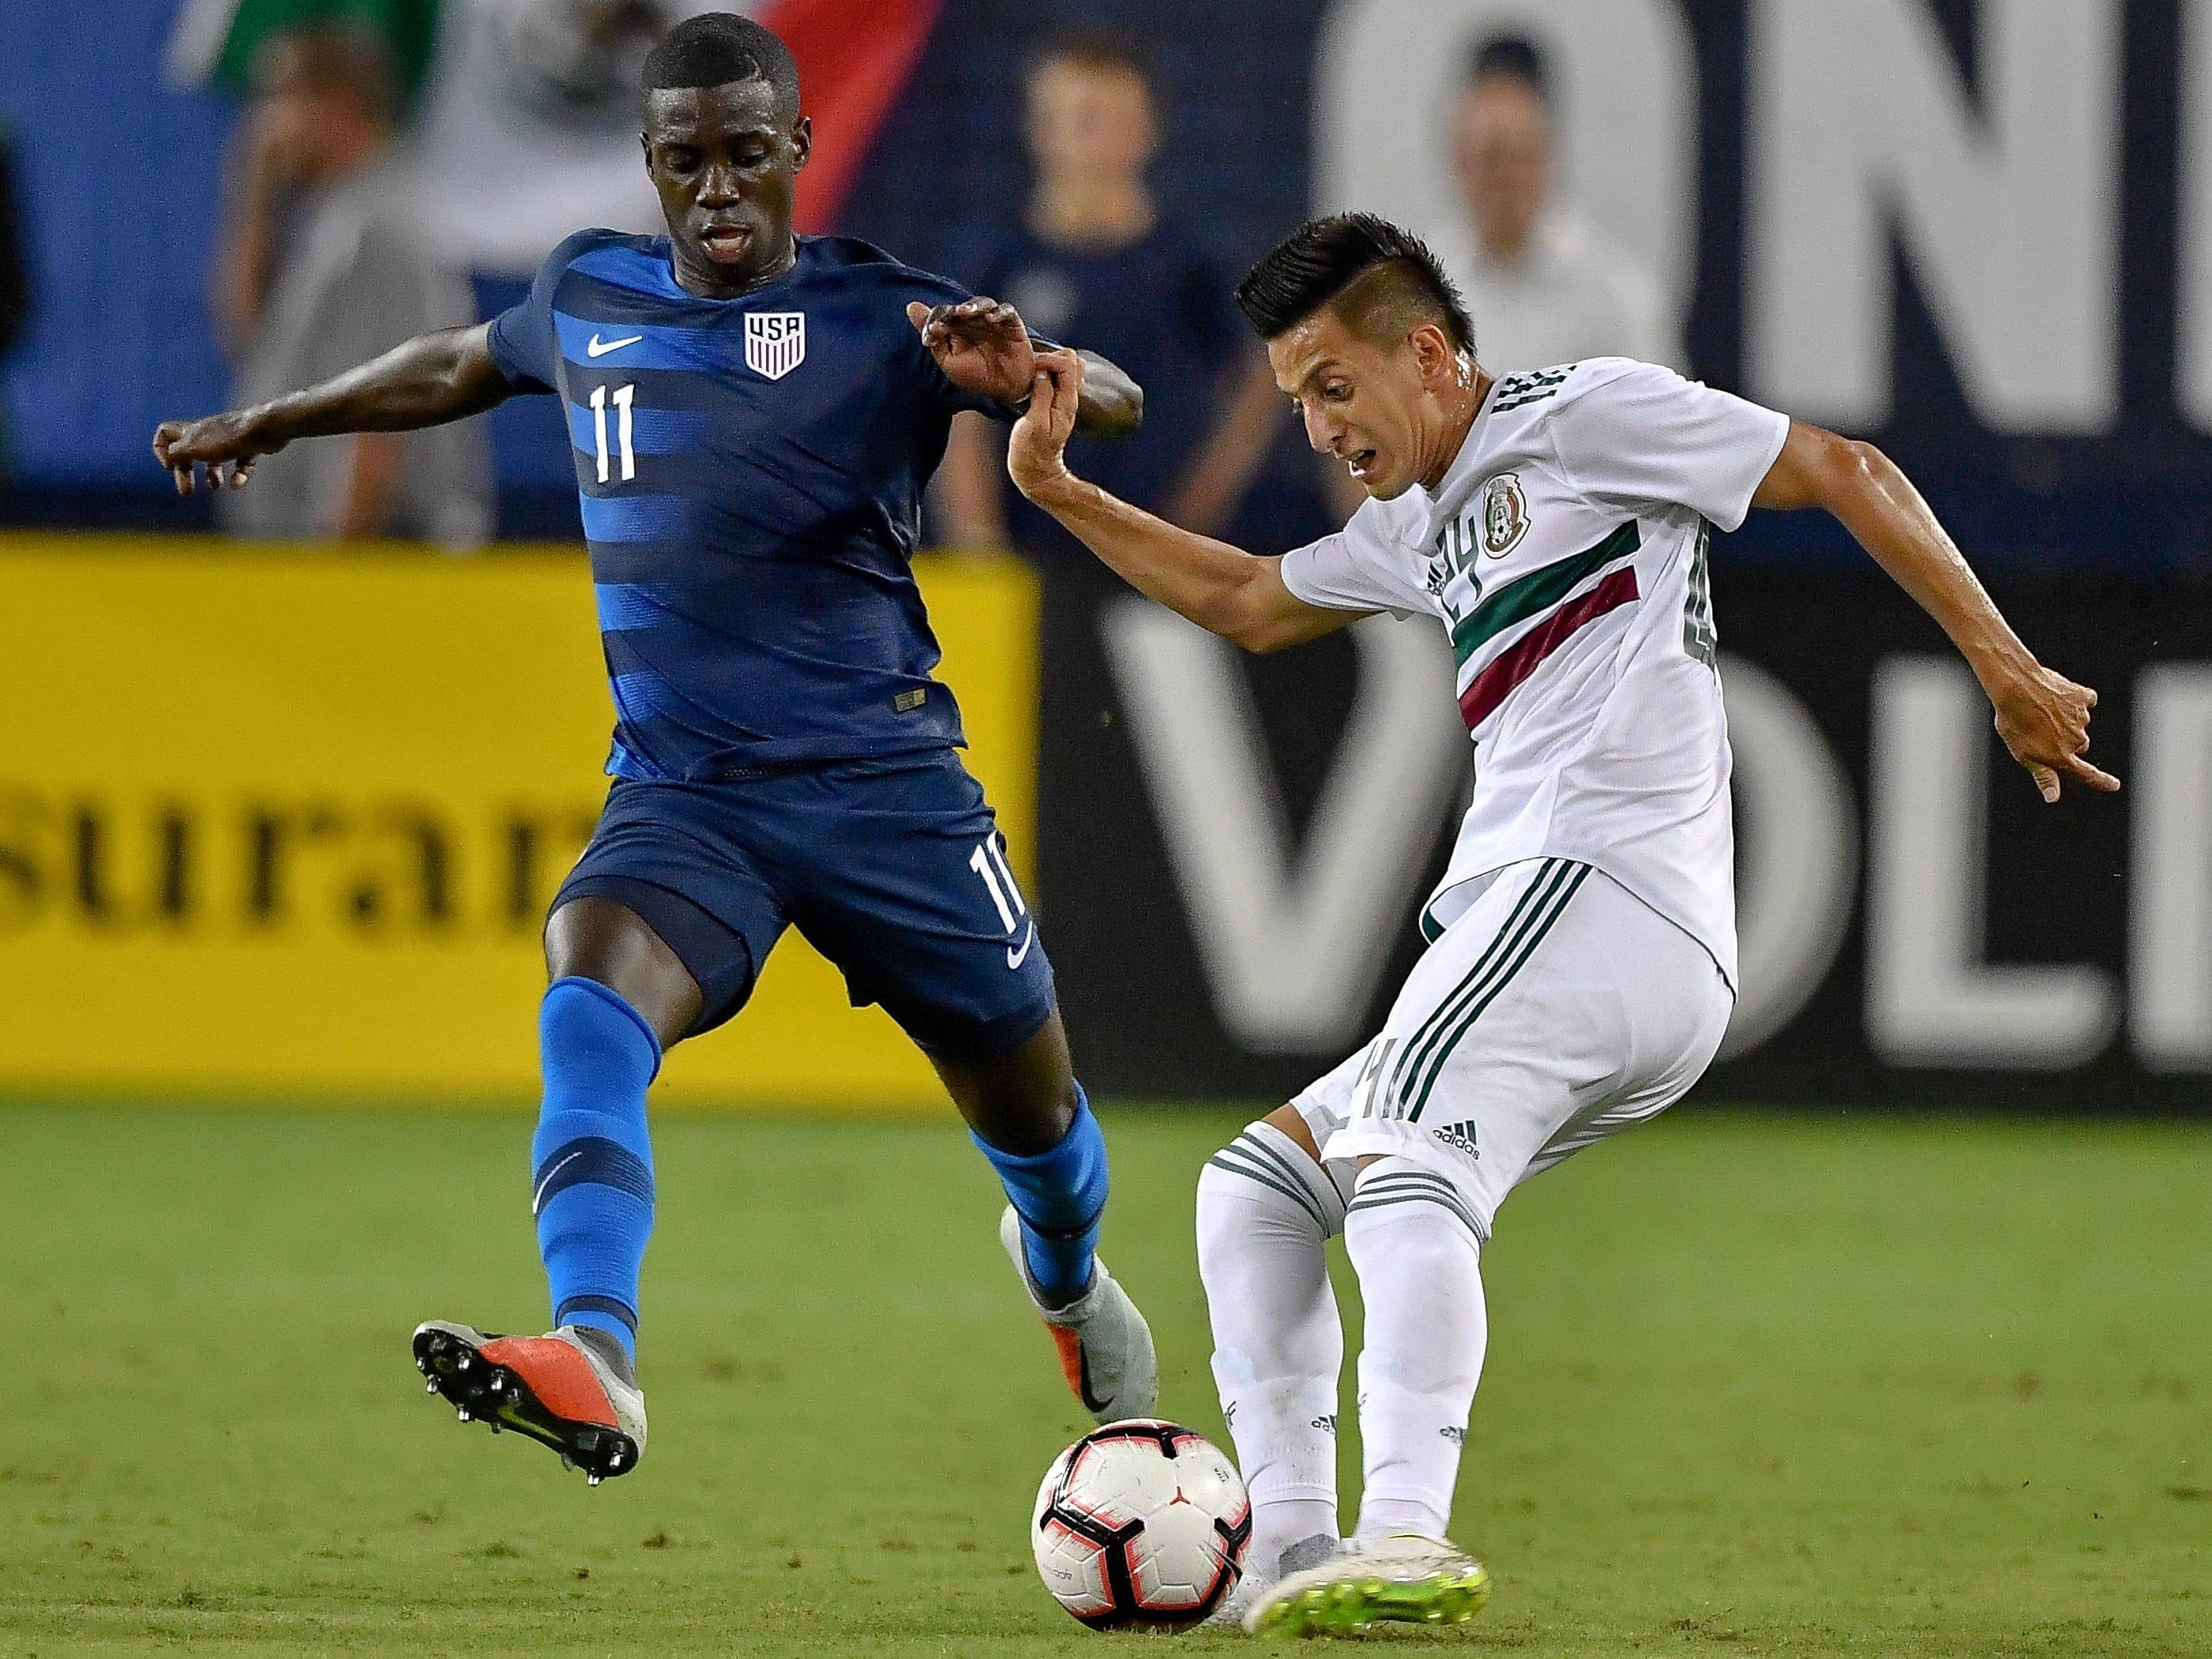 Mexico midfielder Roberto Alvarado (24) battles USA midfielder Tim Weah (11) during the first half at Nissan Stadium in Nashville, Tenn., Tuesday, Sept. 11, 2018.